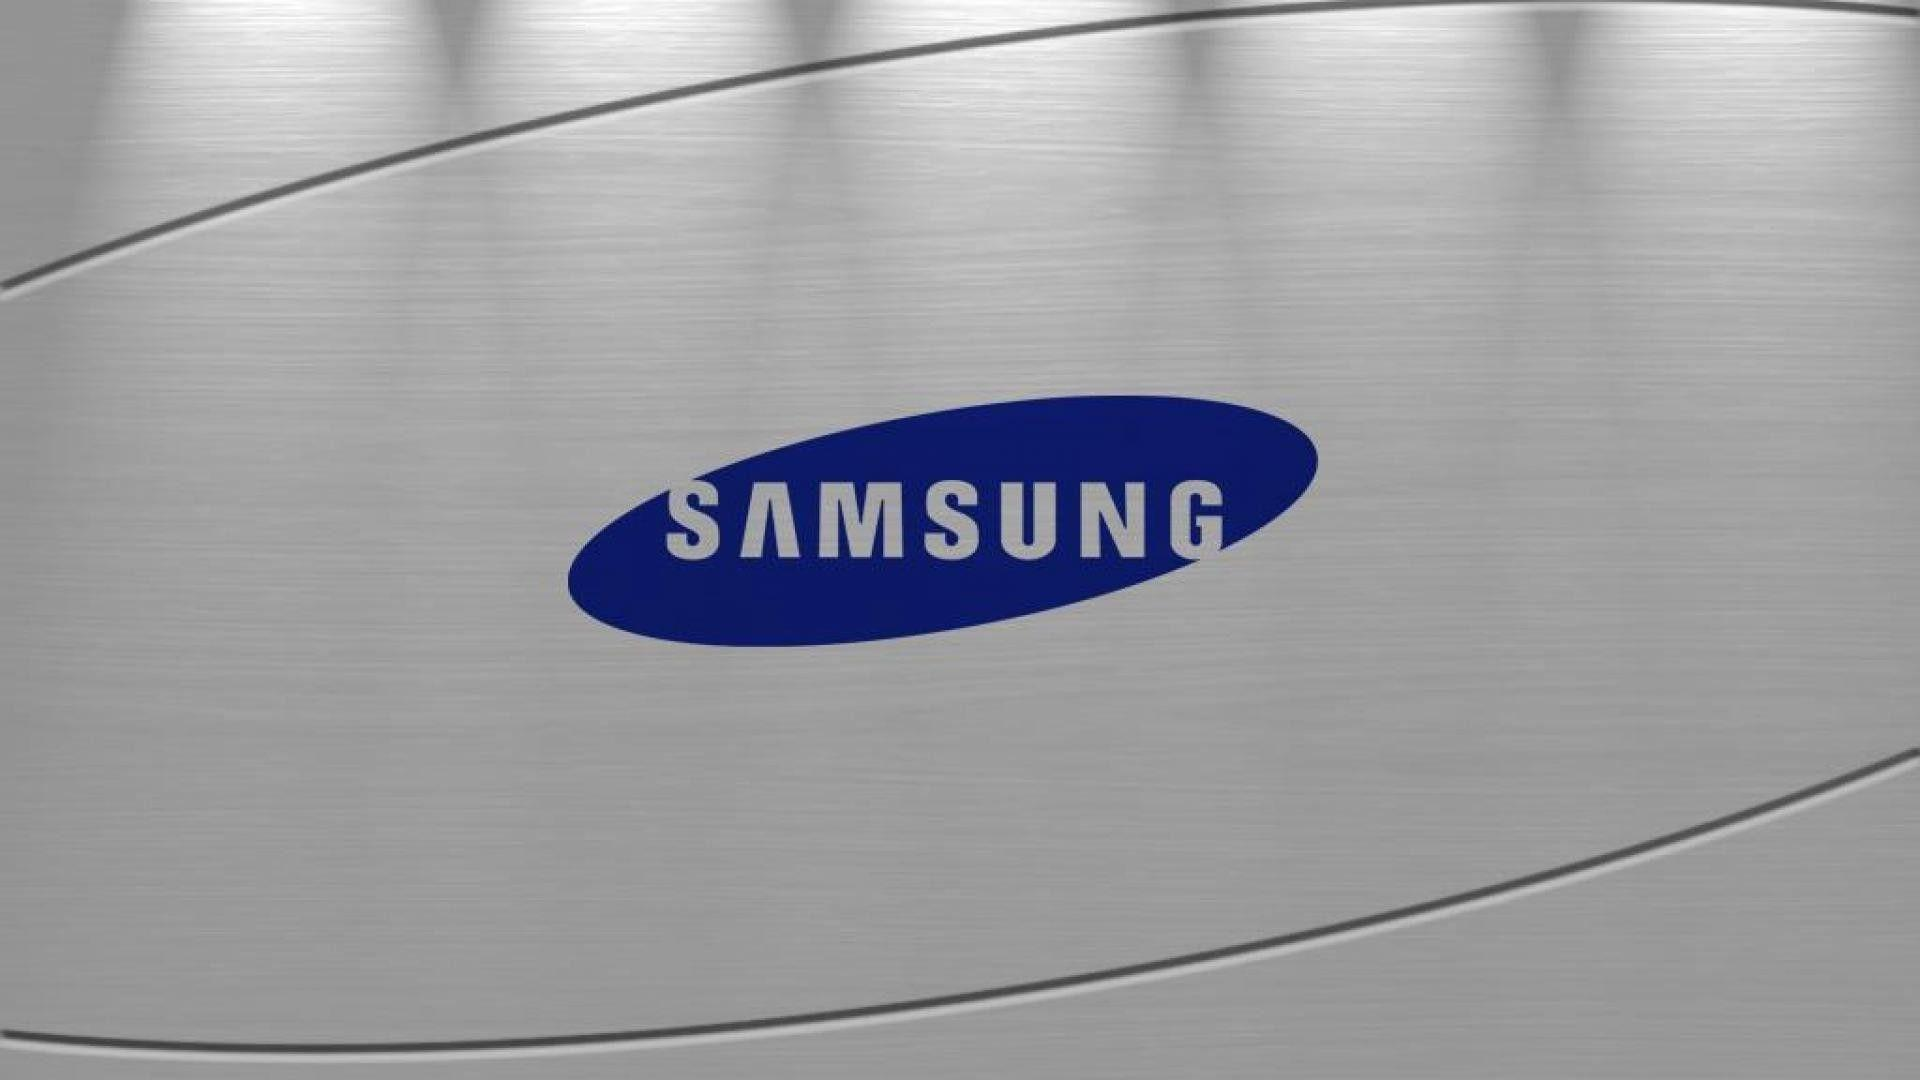 Samsung Led Tv Logo Wallpapers Wallpaper Cave